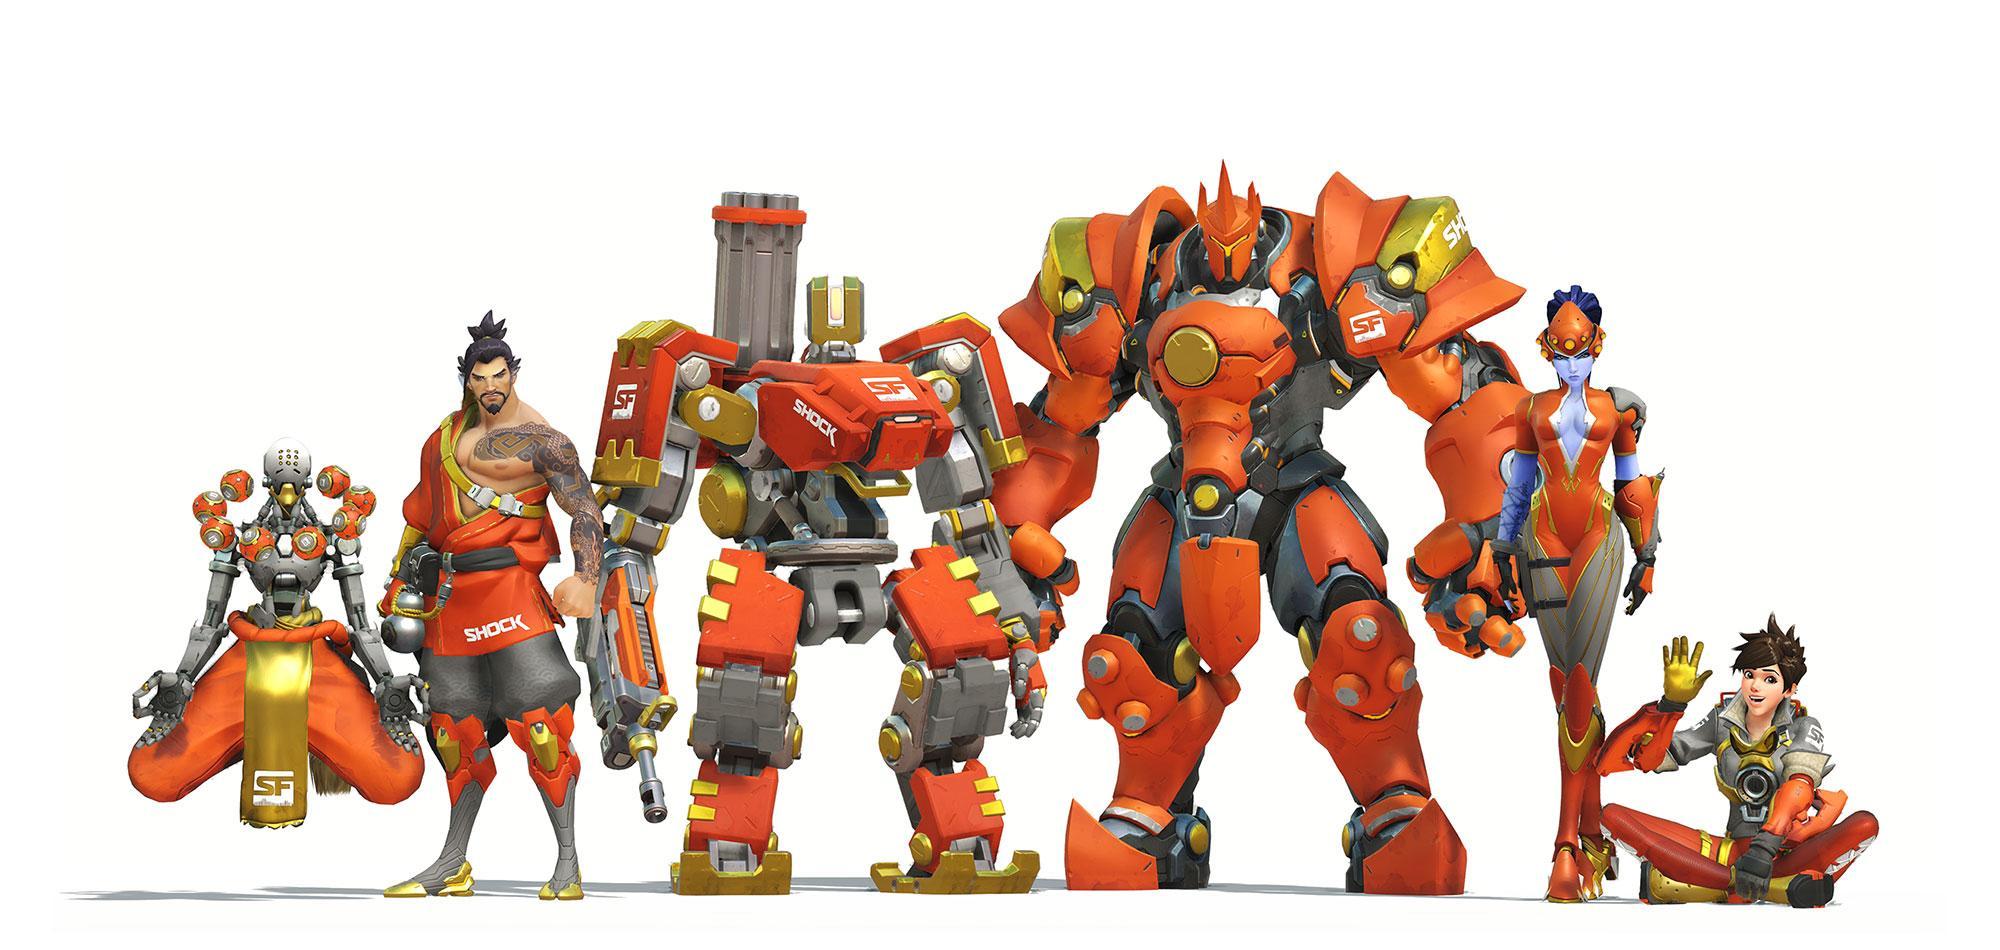 Overwatch League Orange Skins